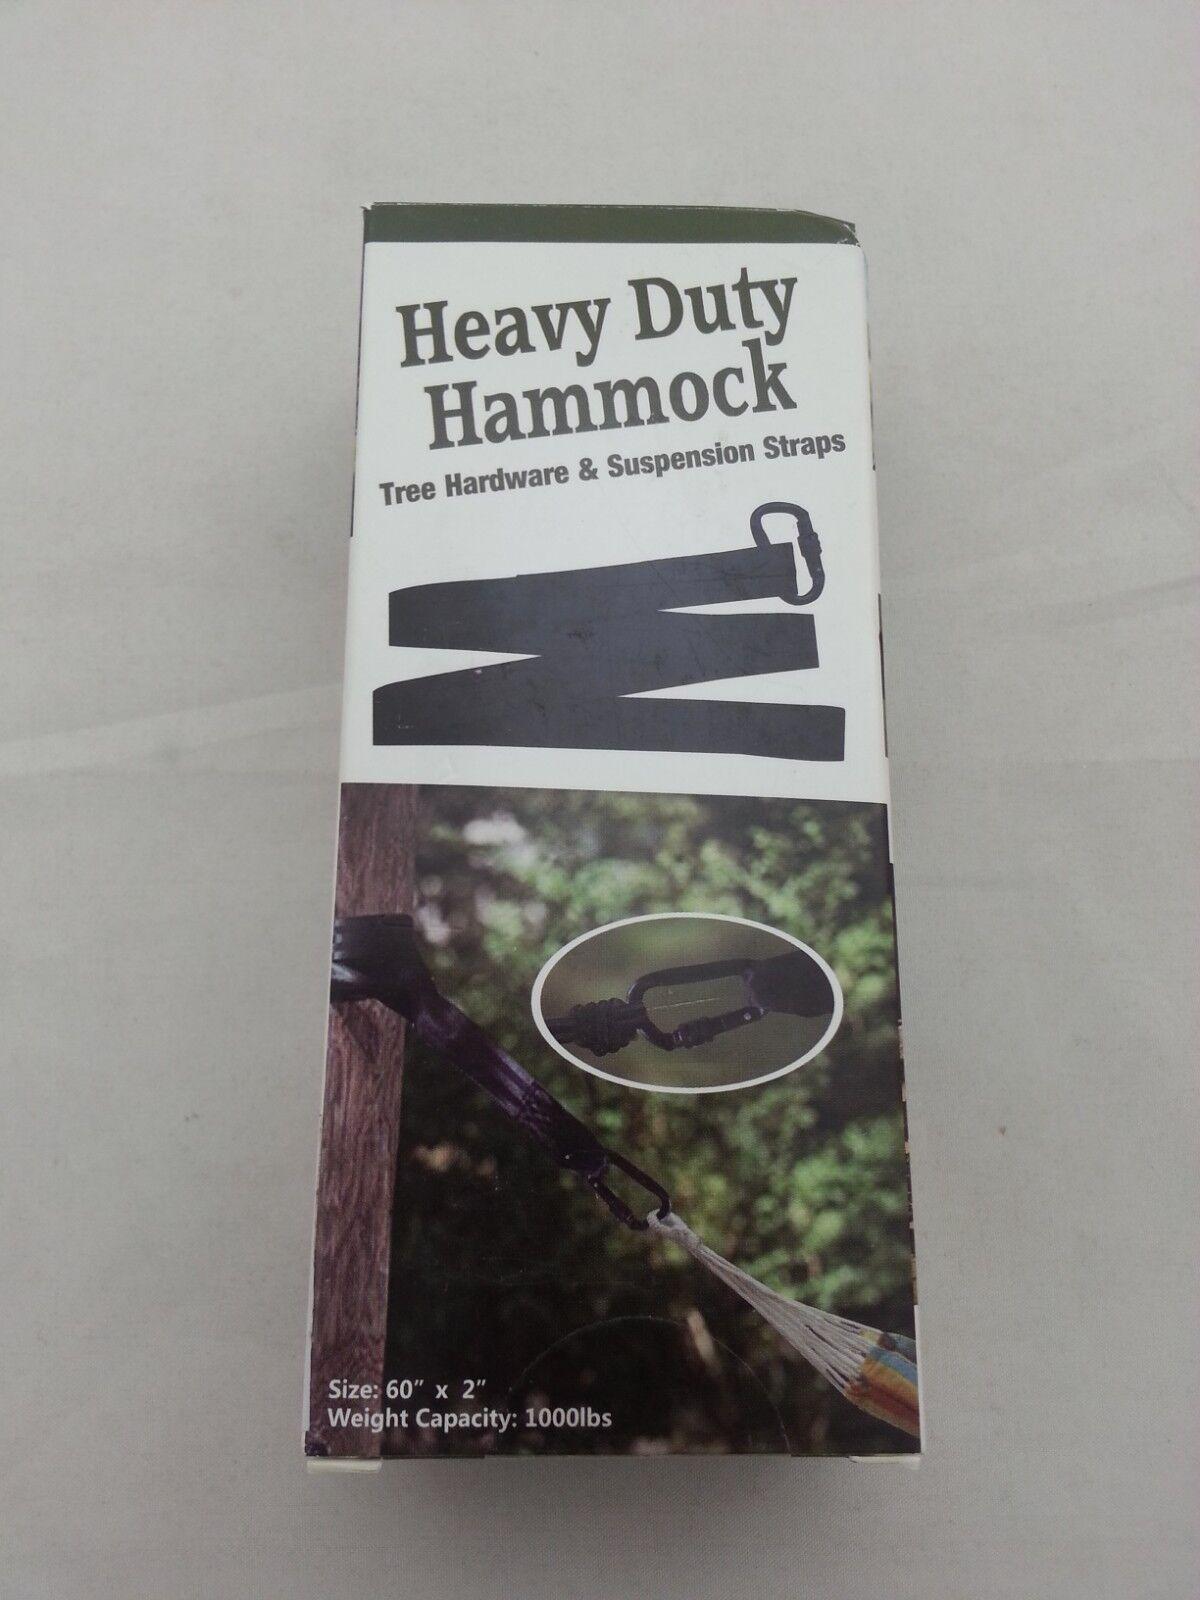 Heavy Duty Hammock Tree Hardware & Suspension Strap - Single